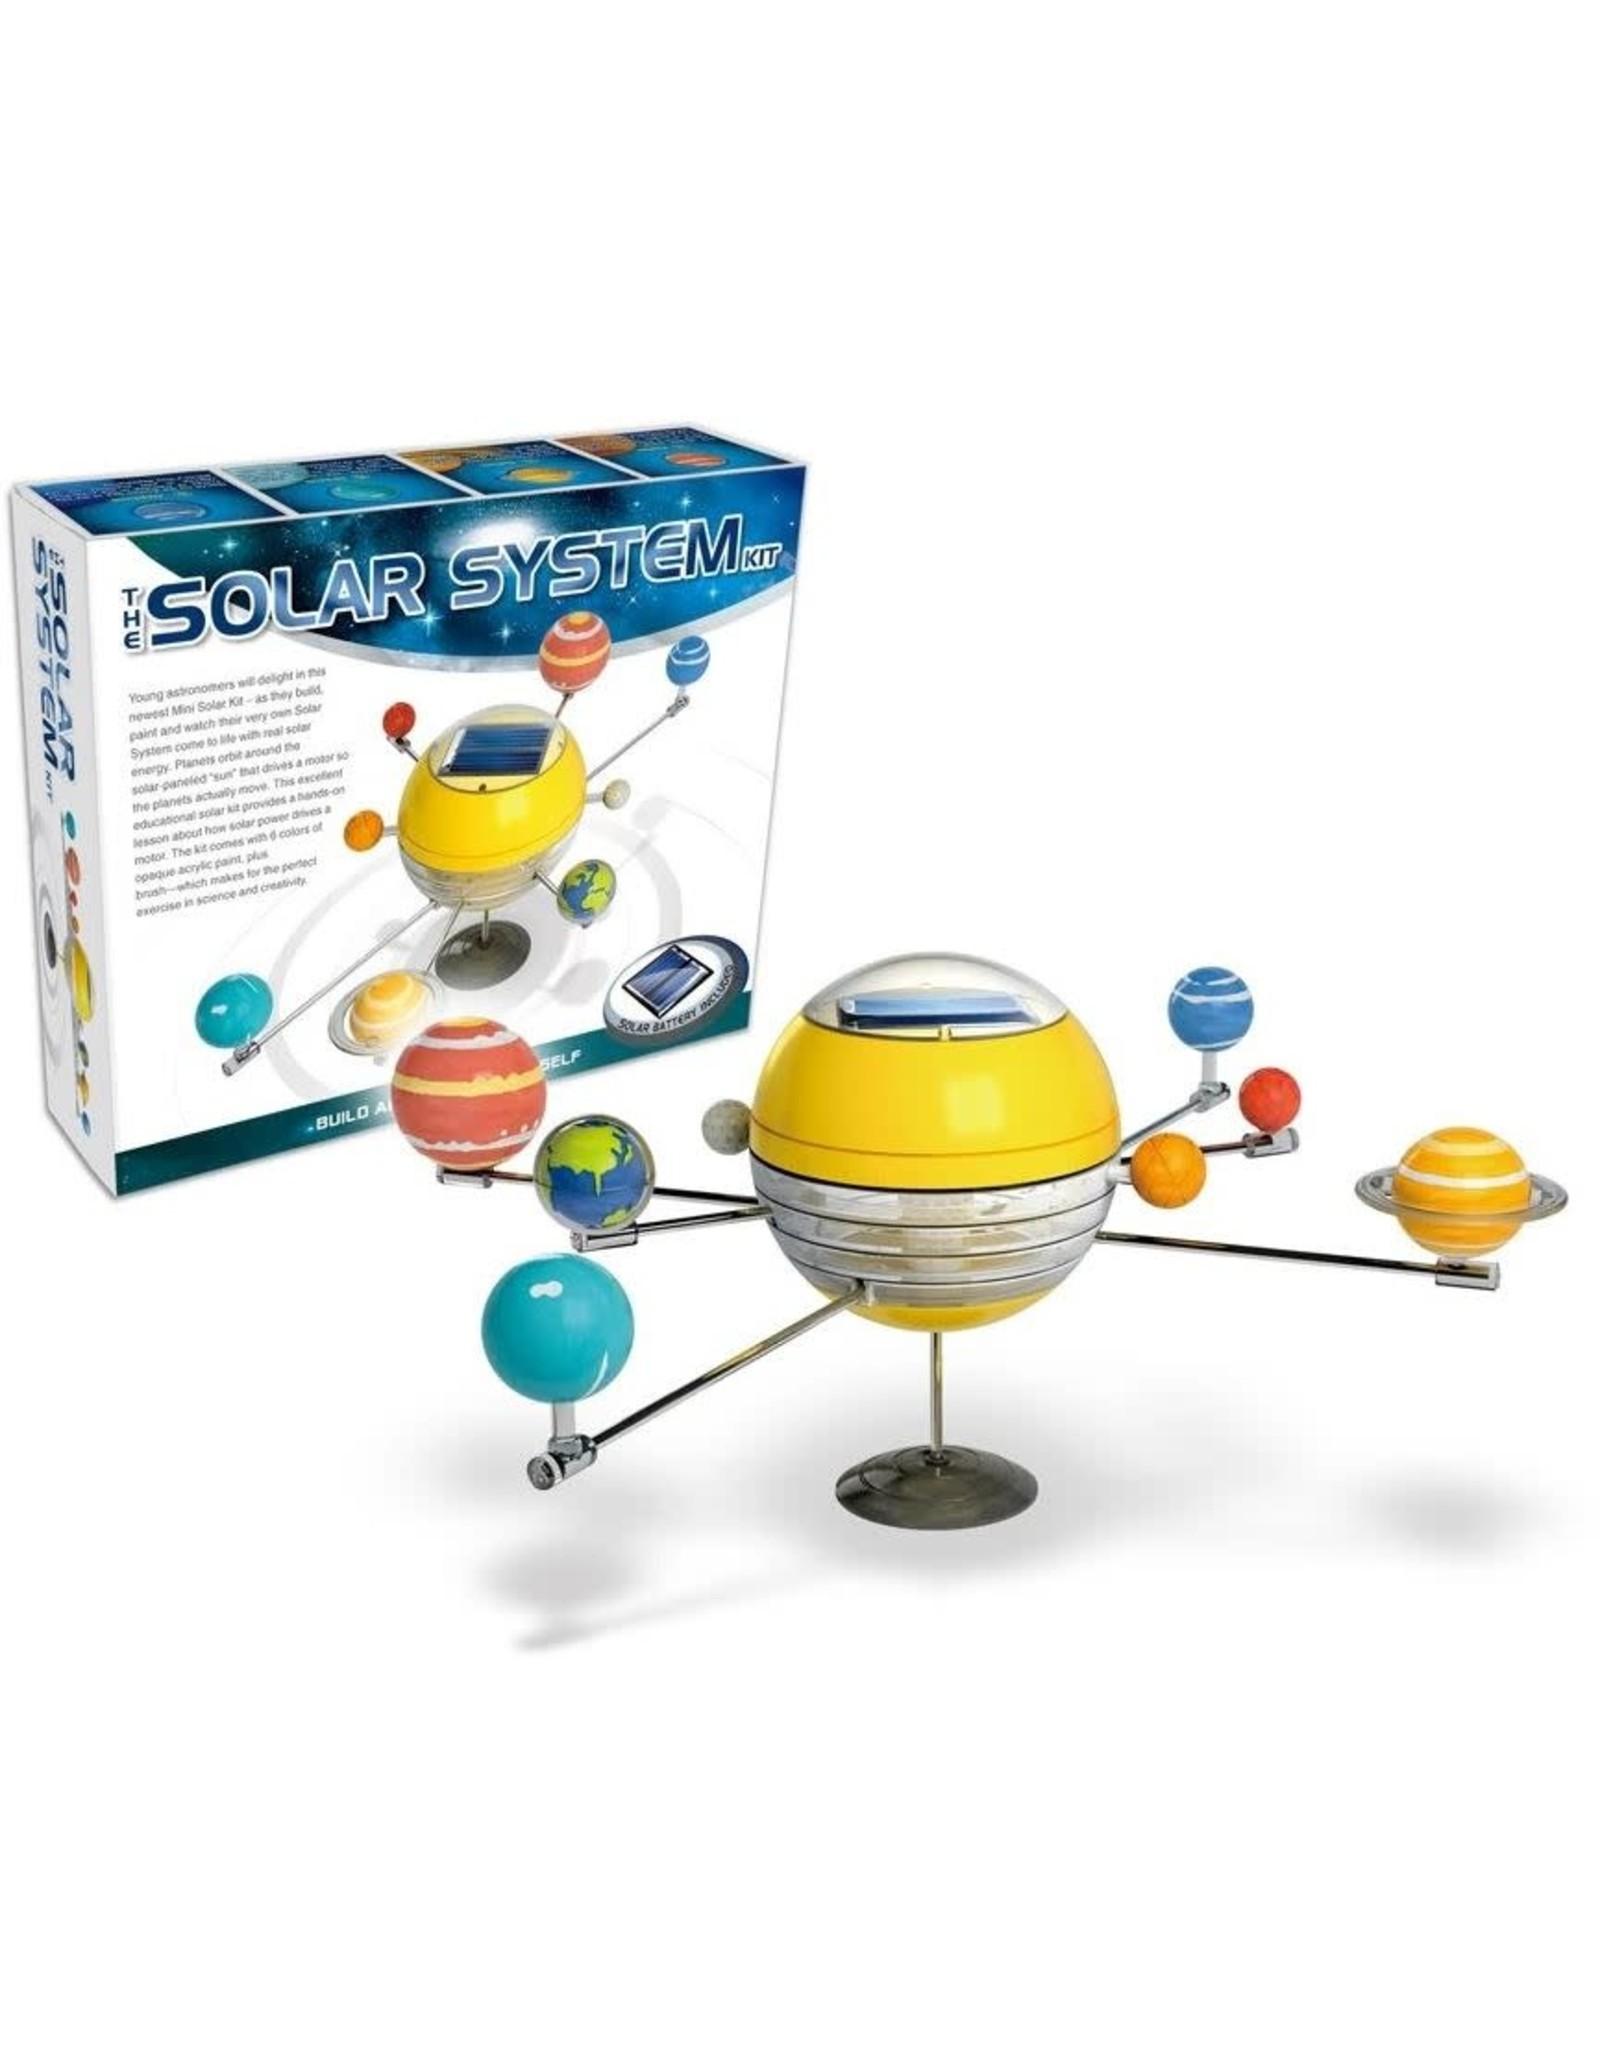 Johnco - The Solar System Kit